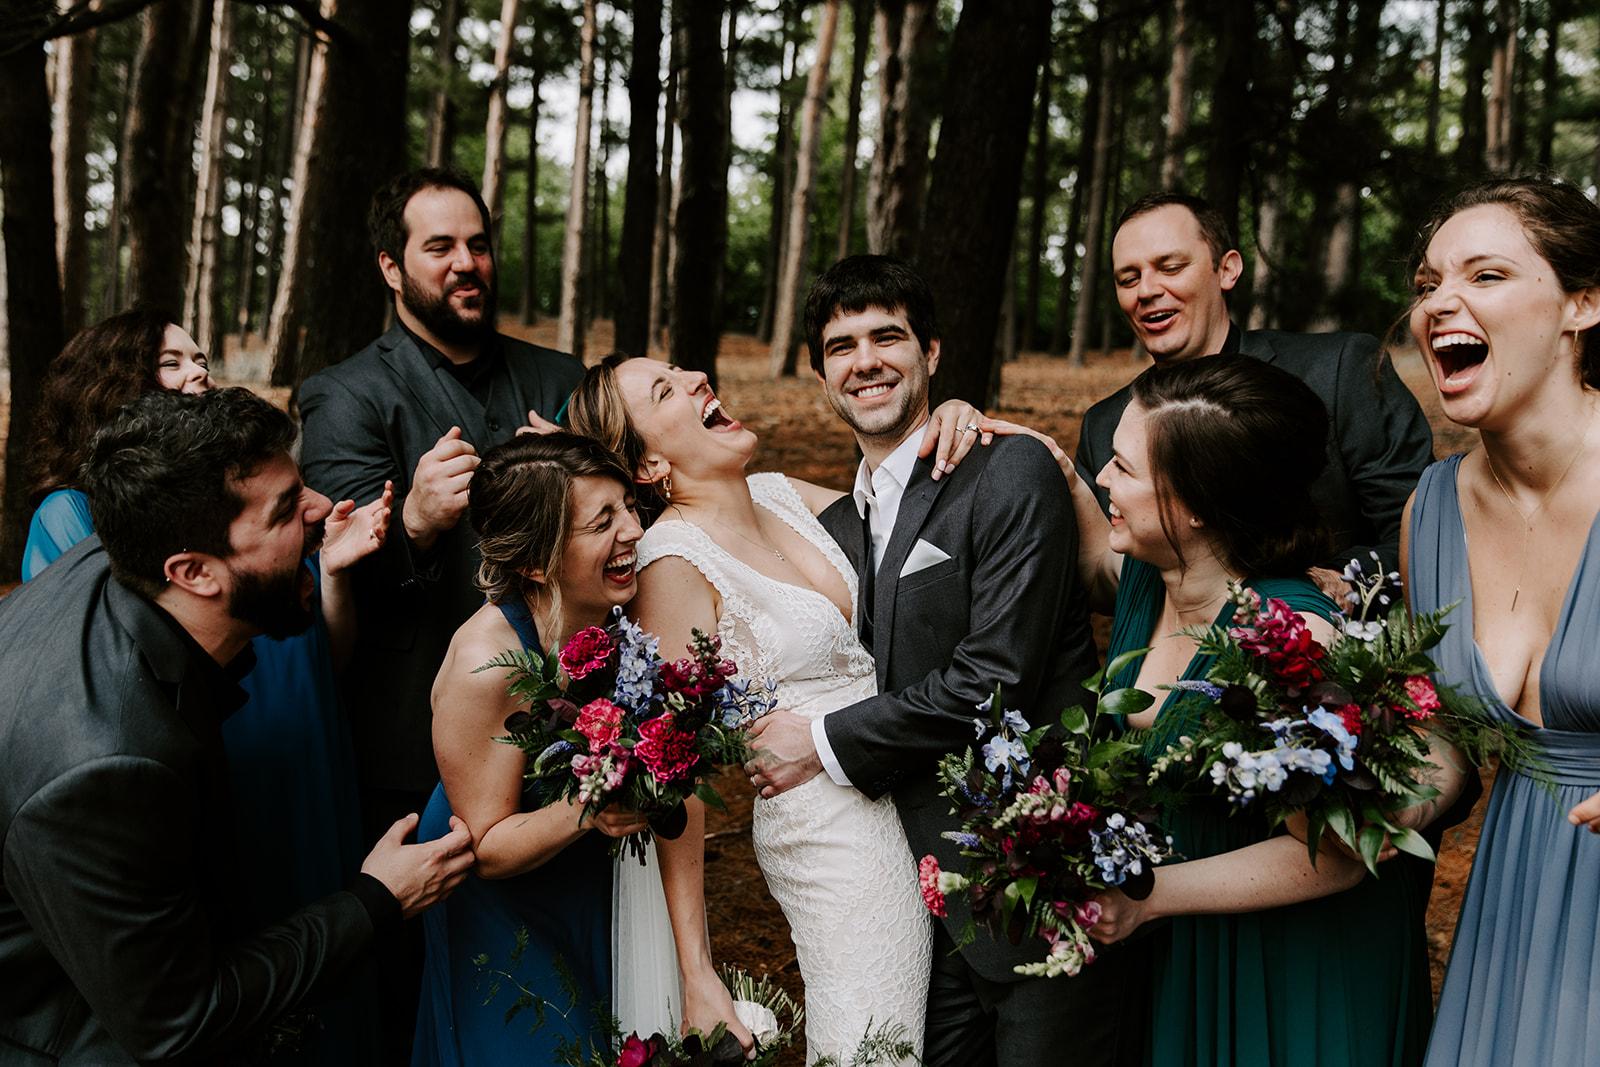 2019-06-01-00-Lindsey+Mat-05_Wedding_Party-meandhimphoto-0074-T5D18688.jpg